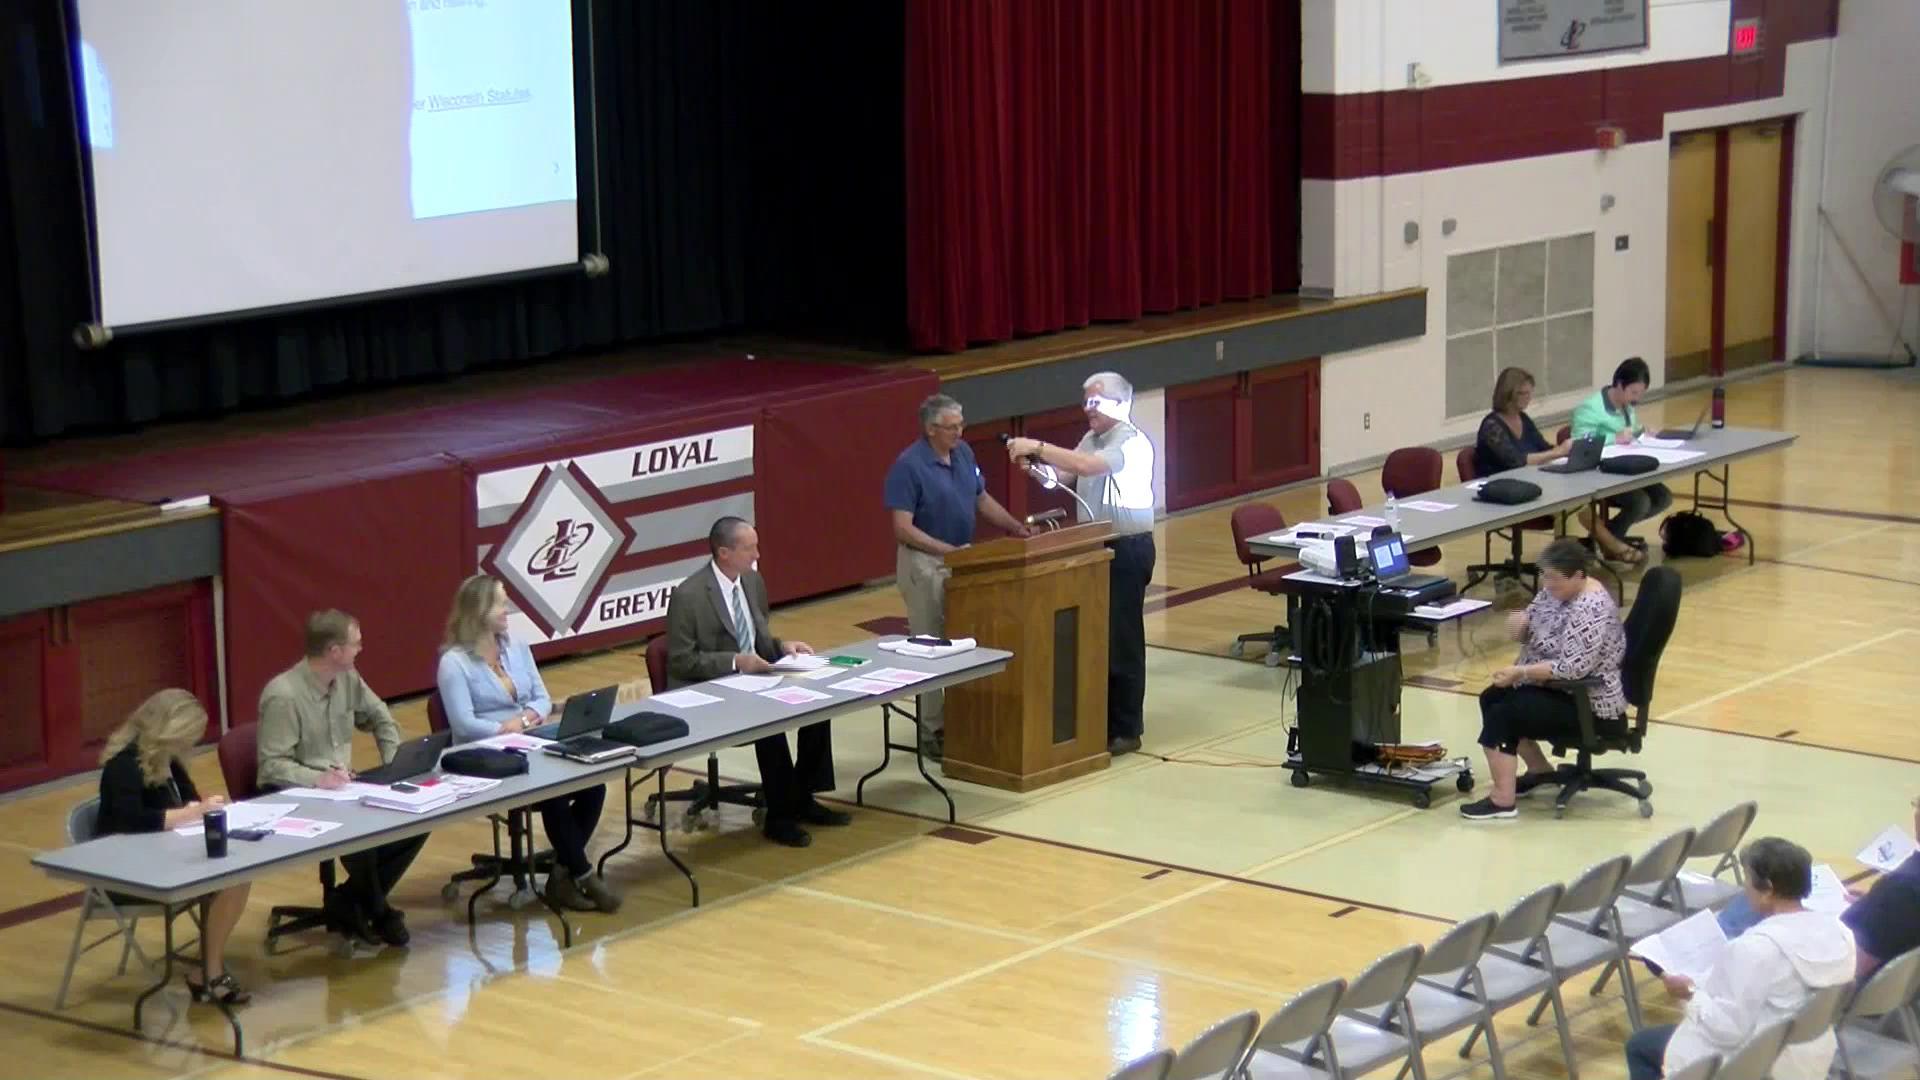 Loyal School Board Annual Meeting